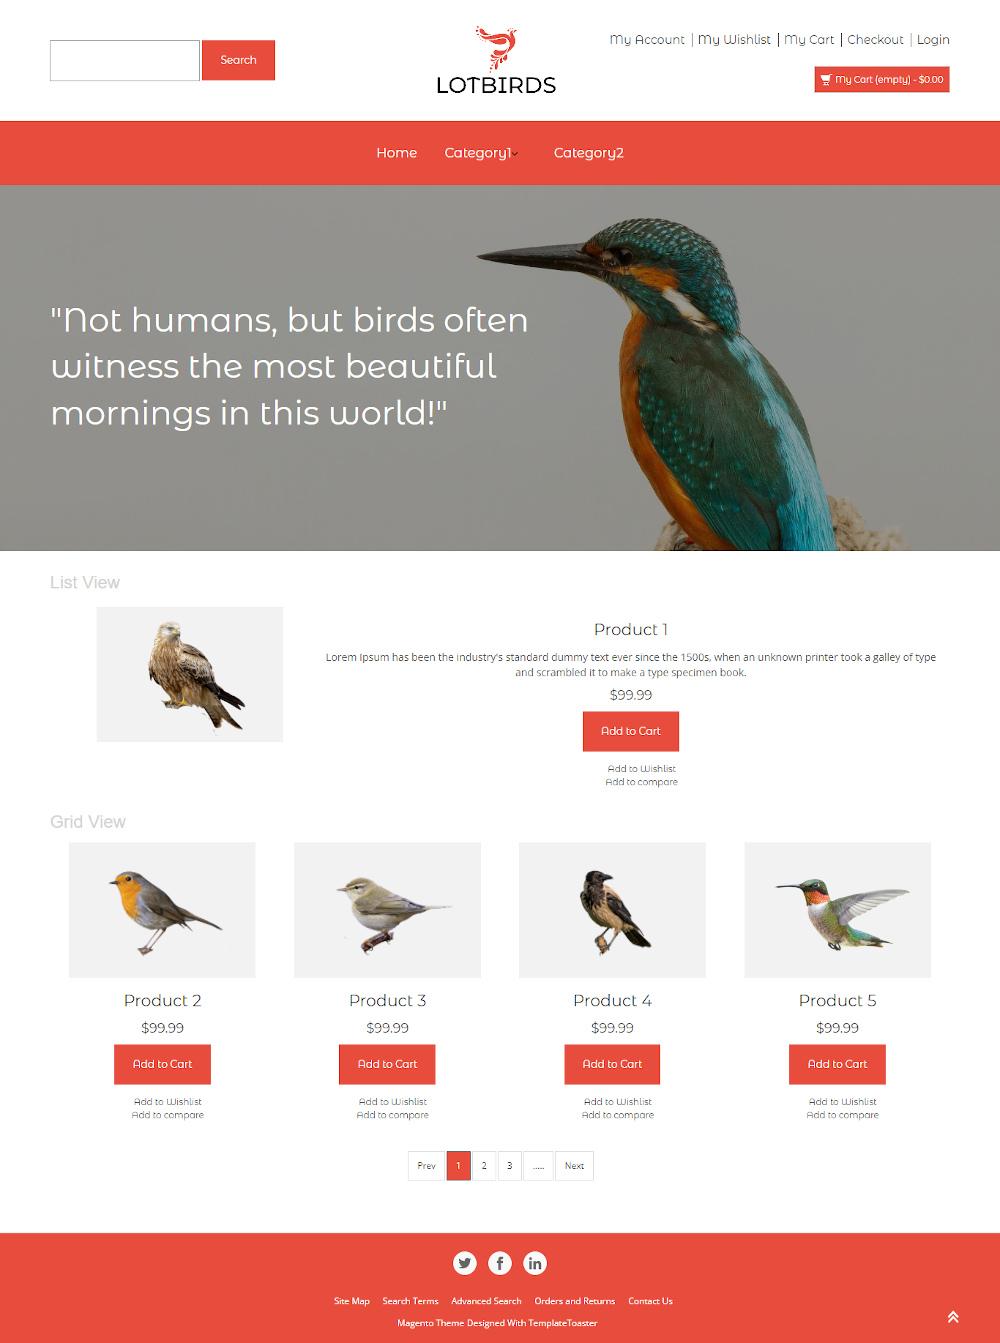 Lotbirds - Online Birds Store Magento Theme